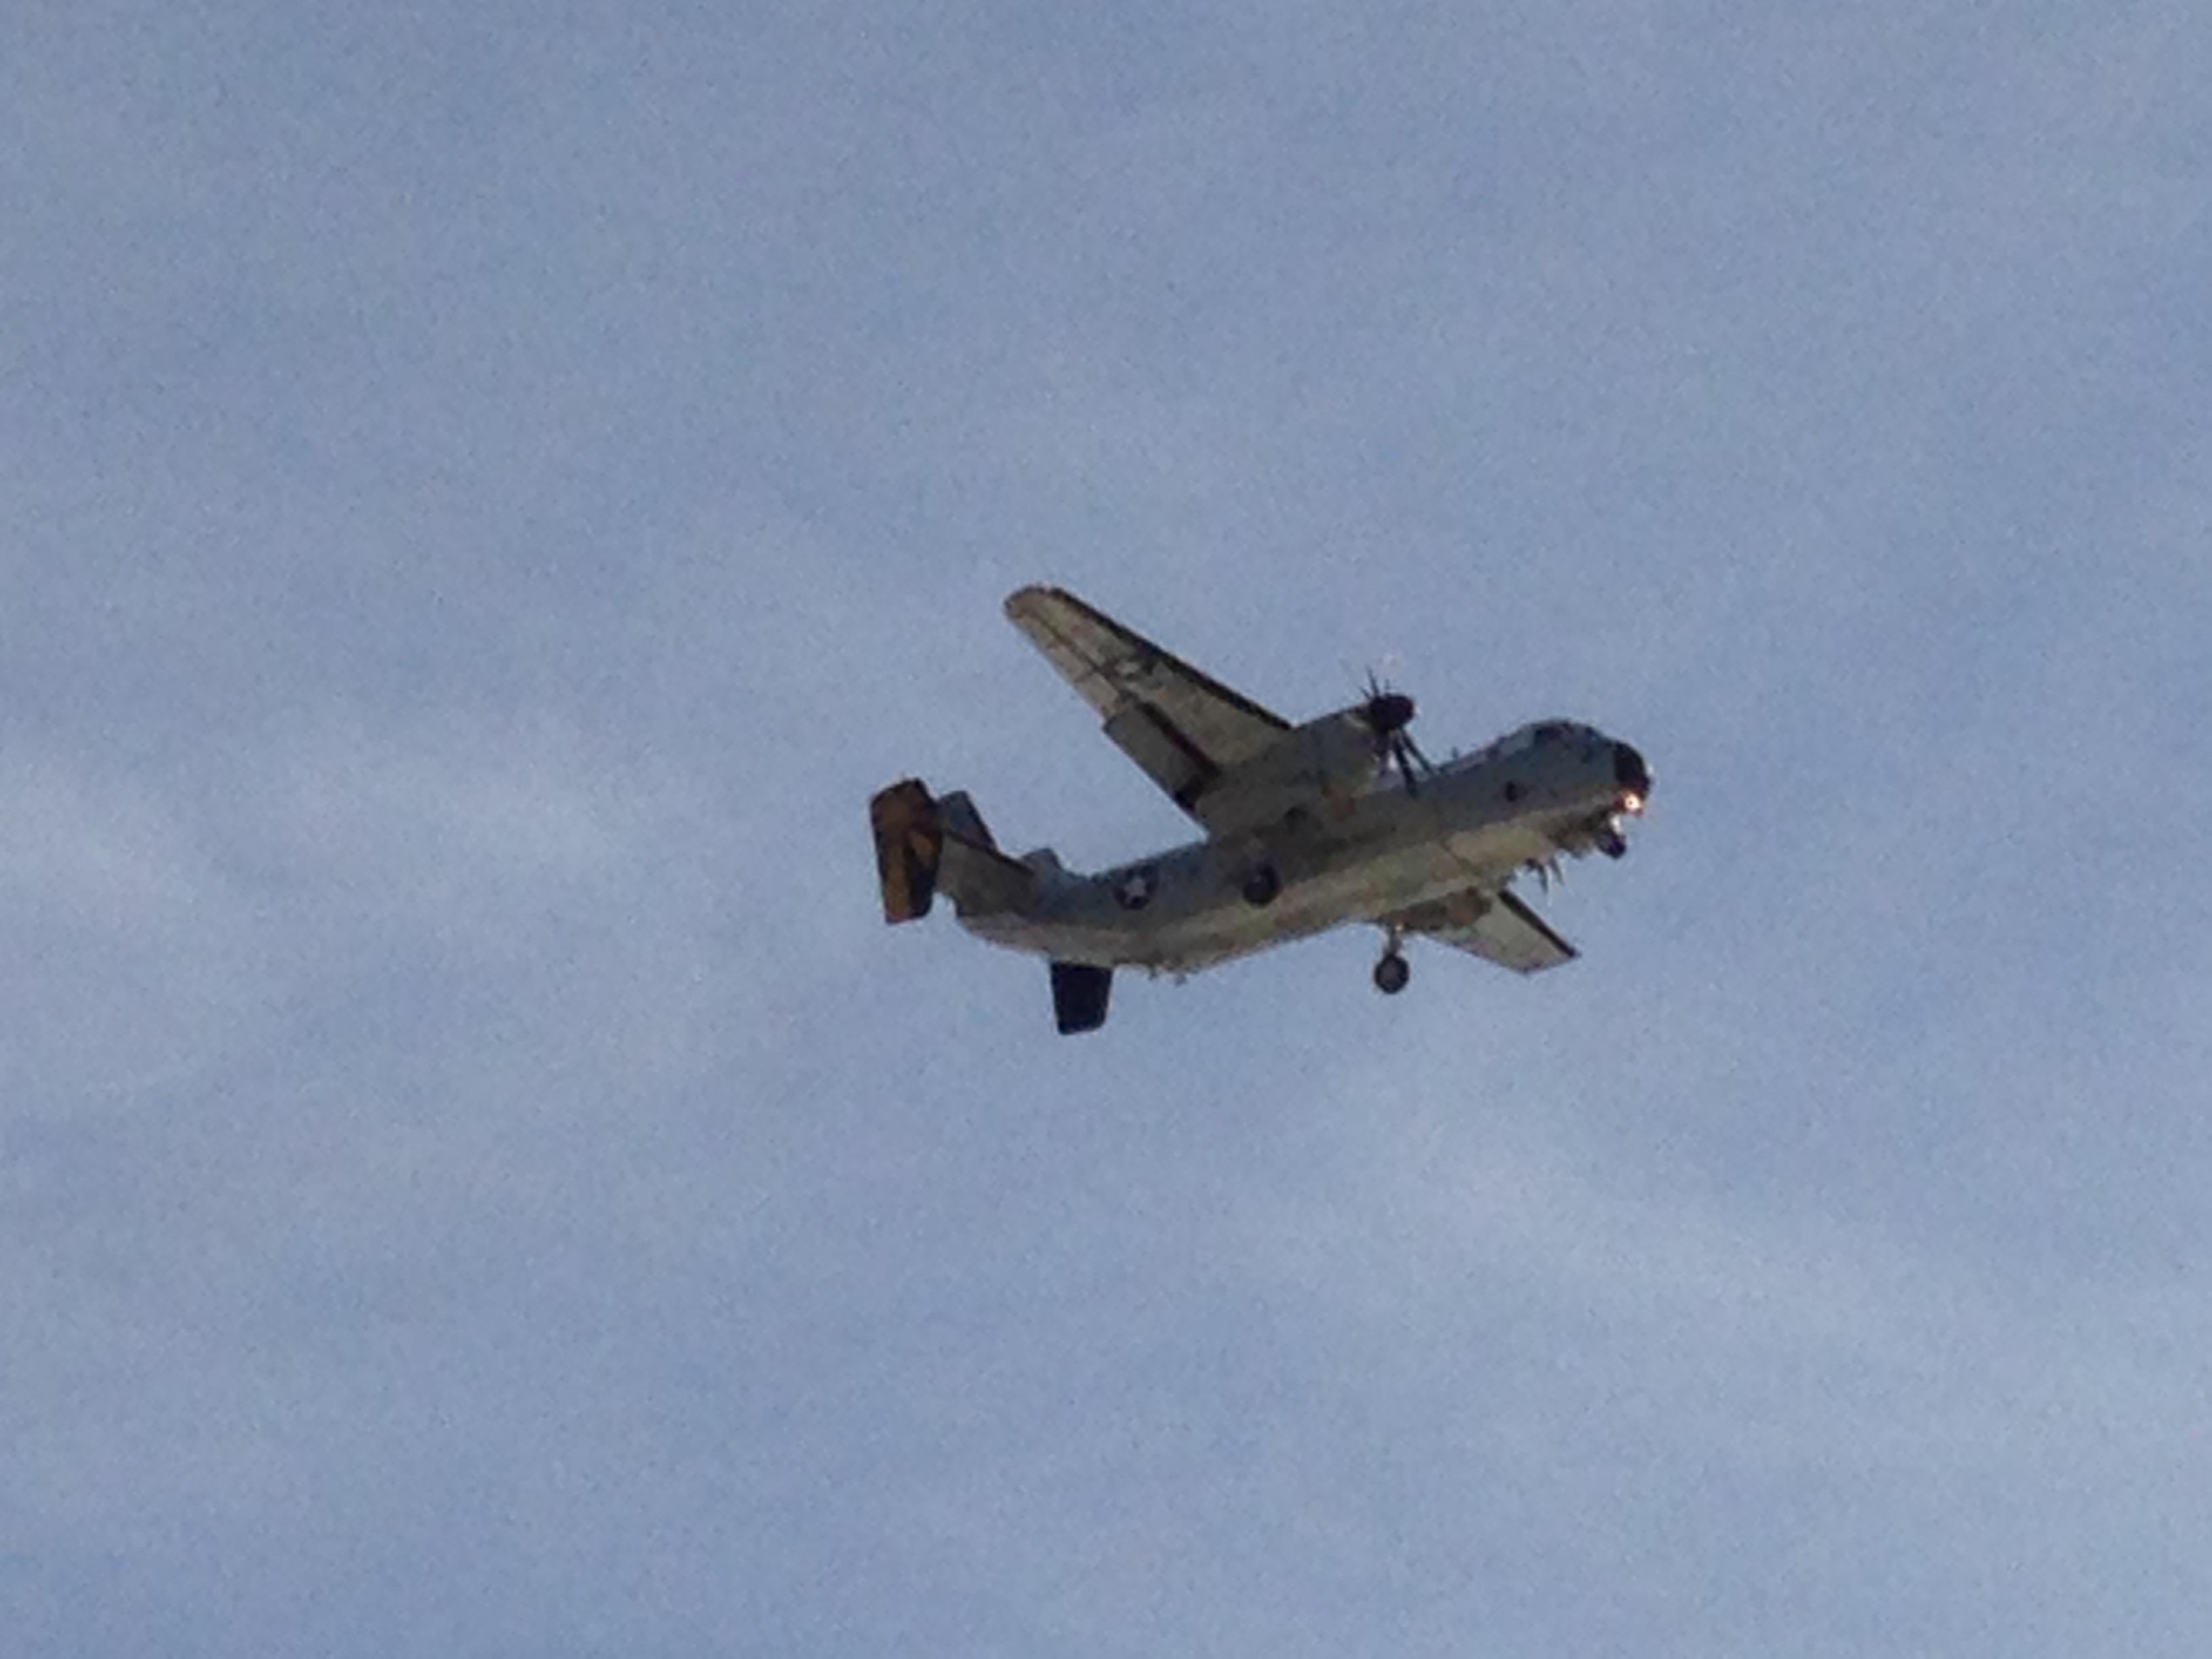 Plane Copyright Shelagh Donnelly